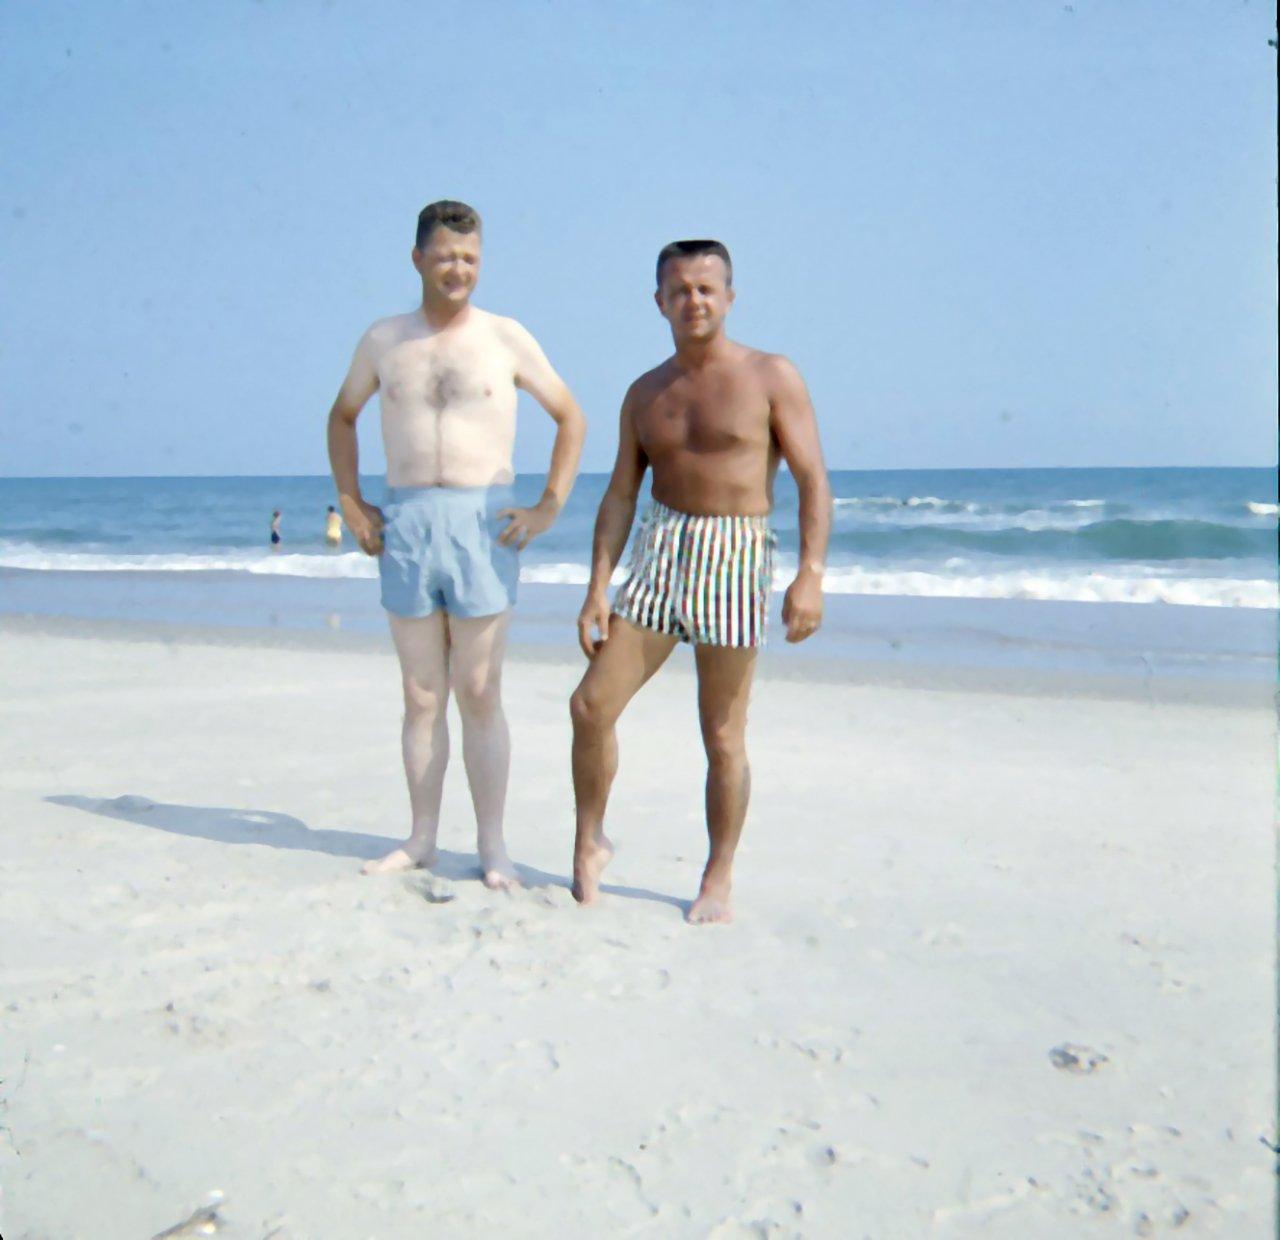 two men on beach